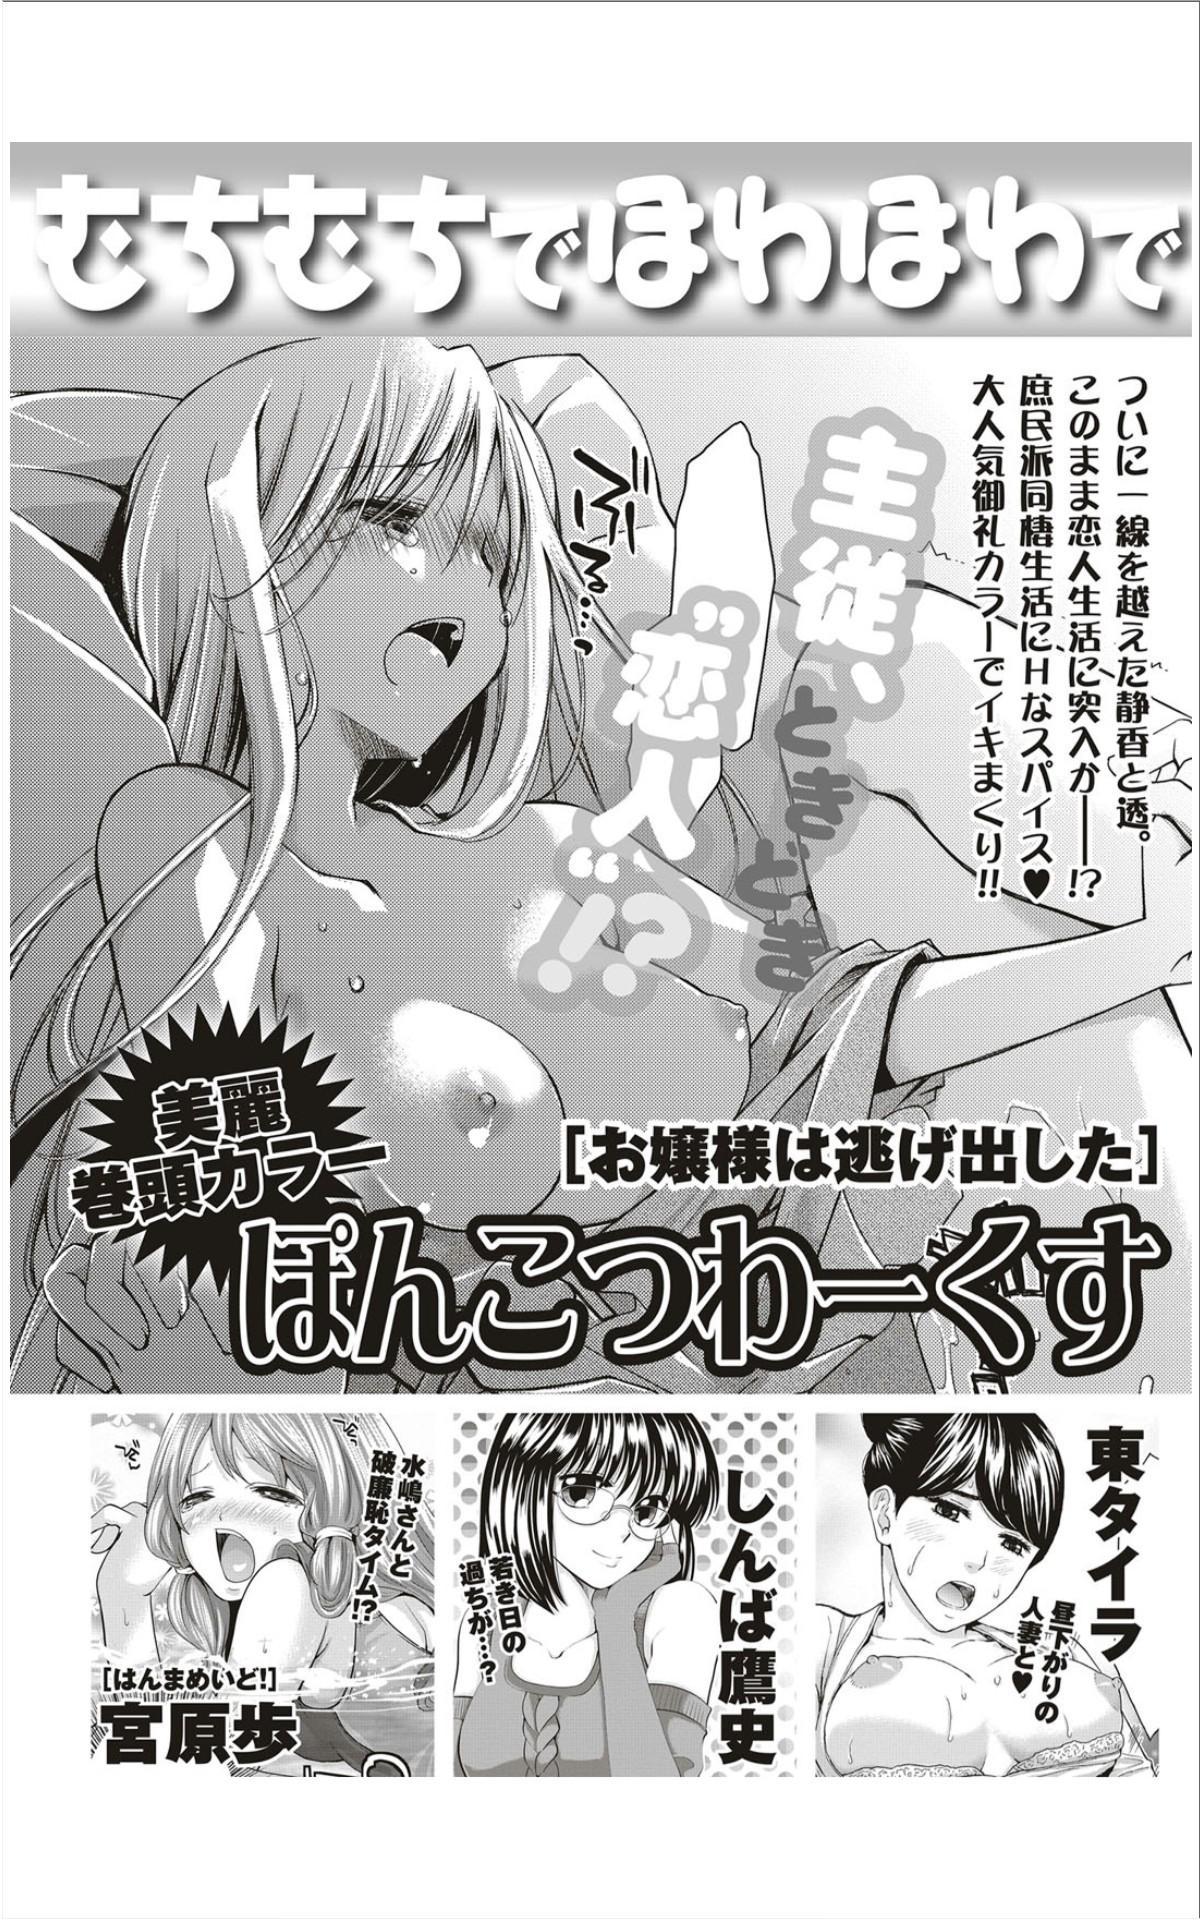 Monthly Vitaman 2012-01 249